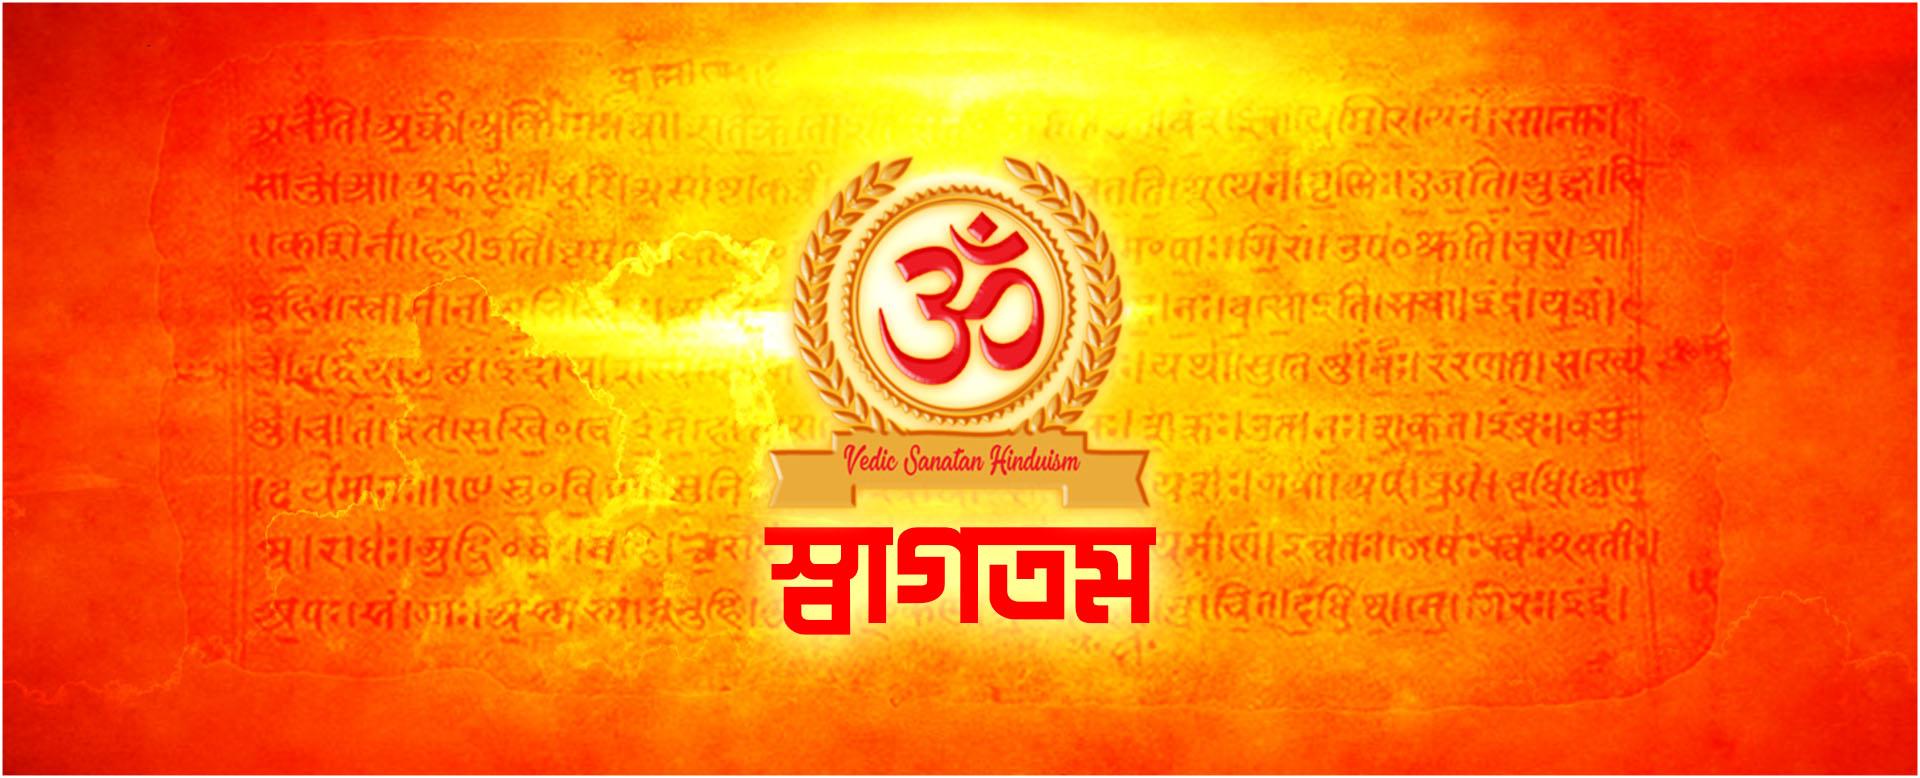 Vedic Sanatan Hinduism, বৈদিক সনাতন হিন্দুত্ববাদ